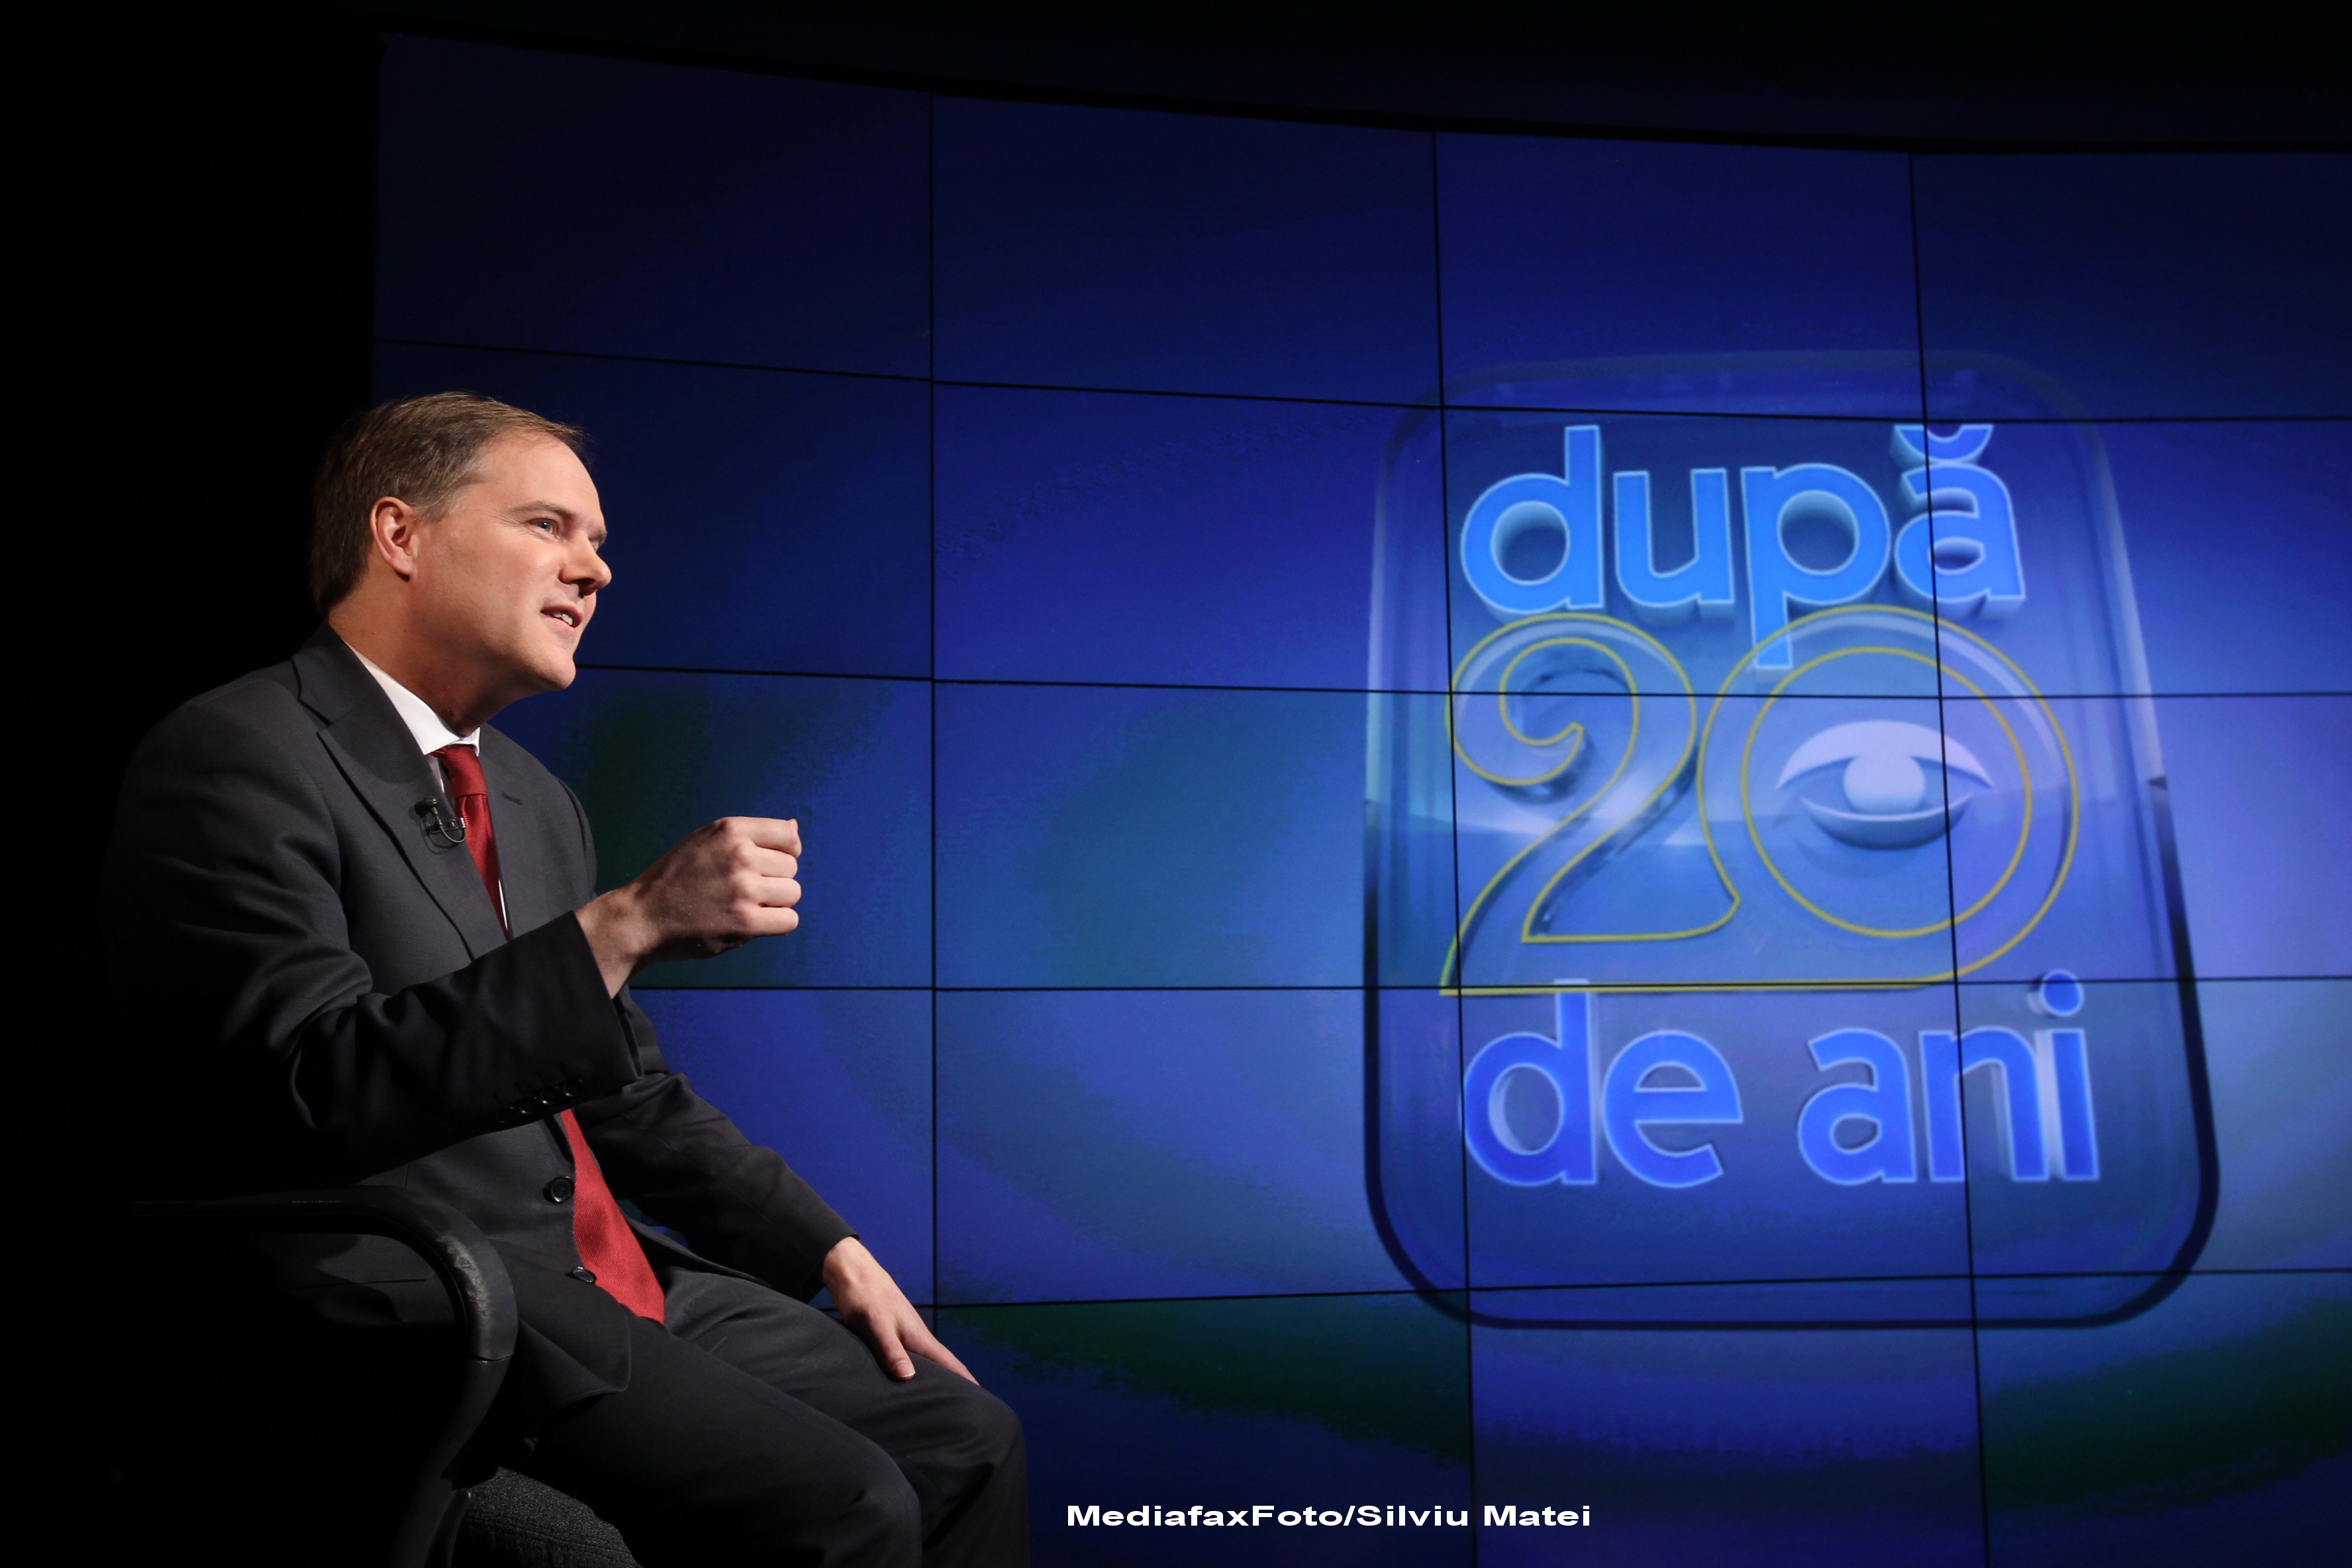 Ambasadorul Marii Britanii, Martin Harris, lauda DNA si ANI pentru lupta cu coruptia in Romania: